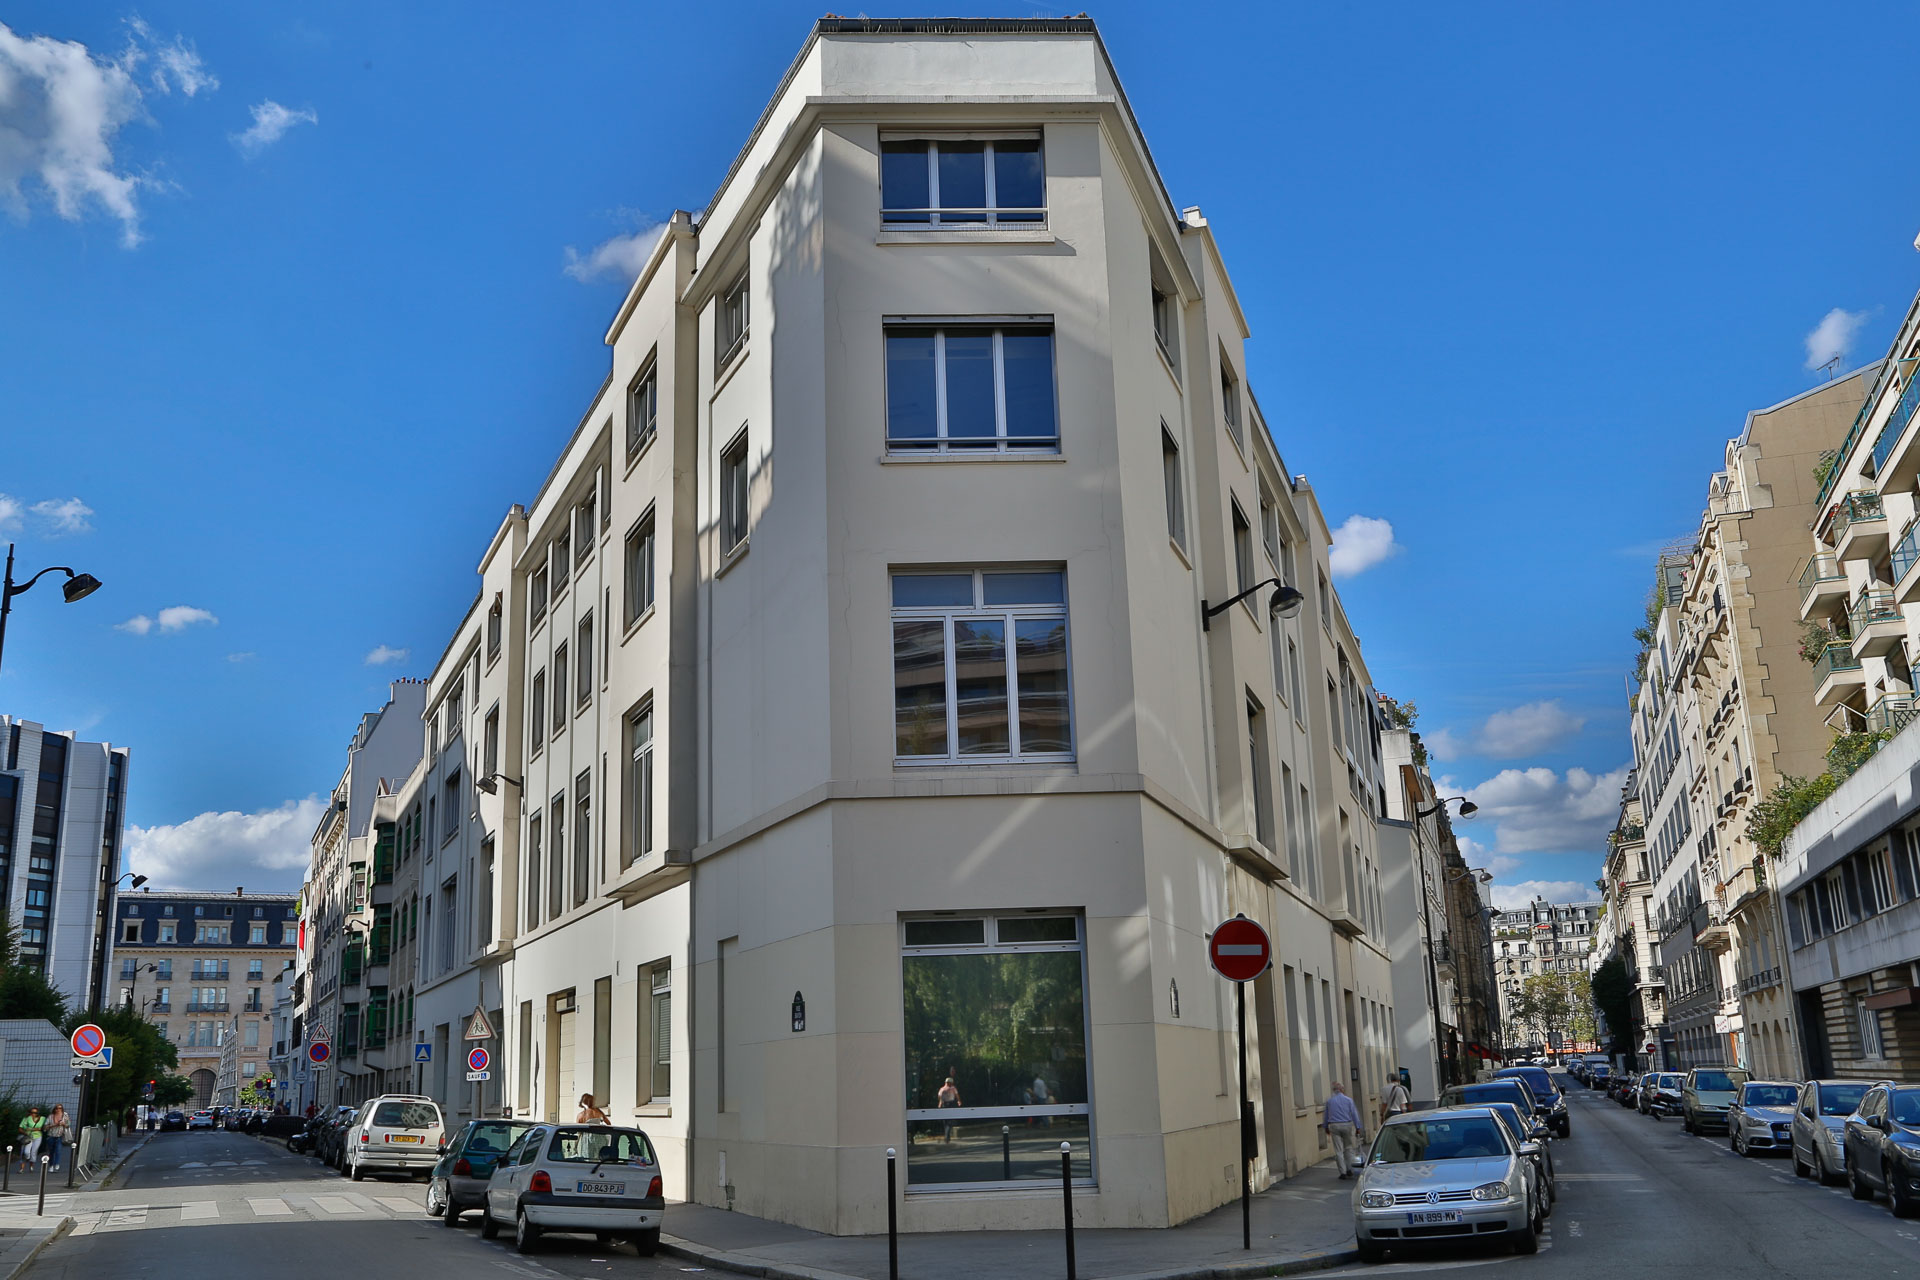 freo-france-photos-immeuble-1-rue-vernier-paris-17-74